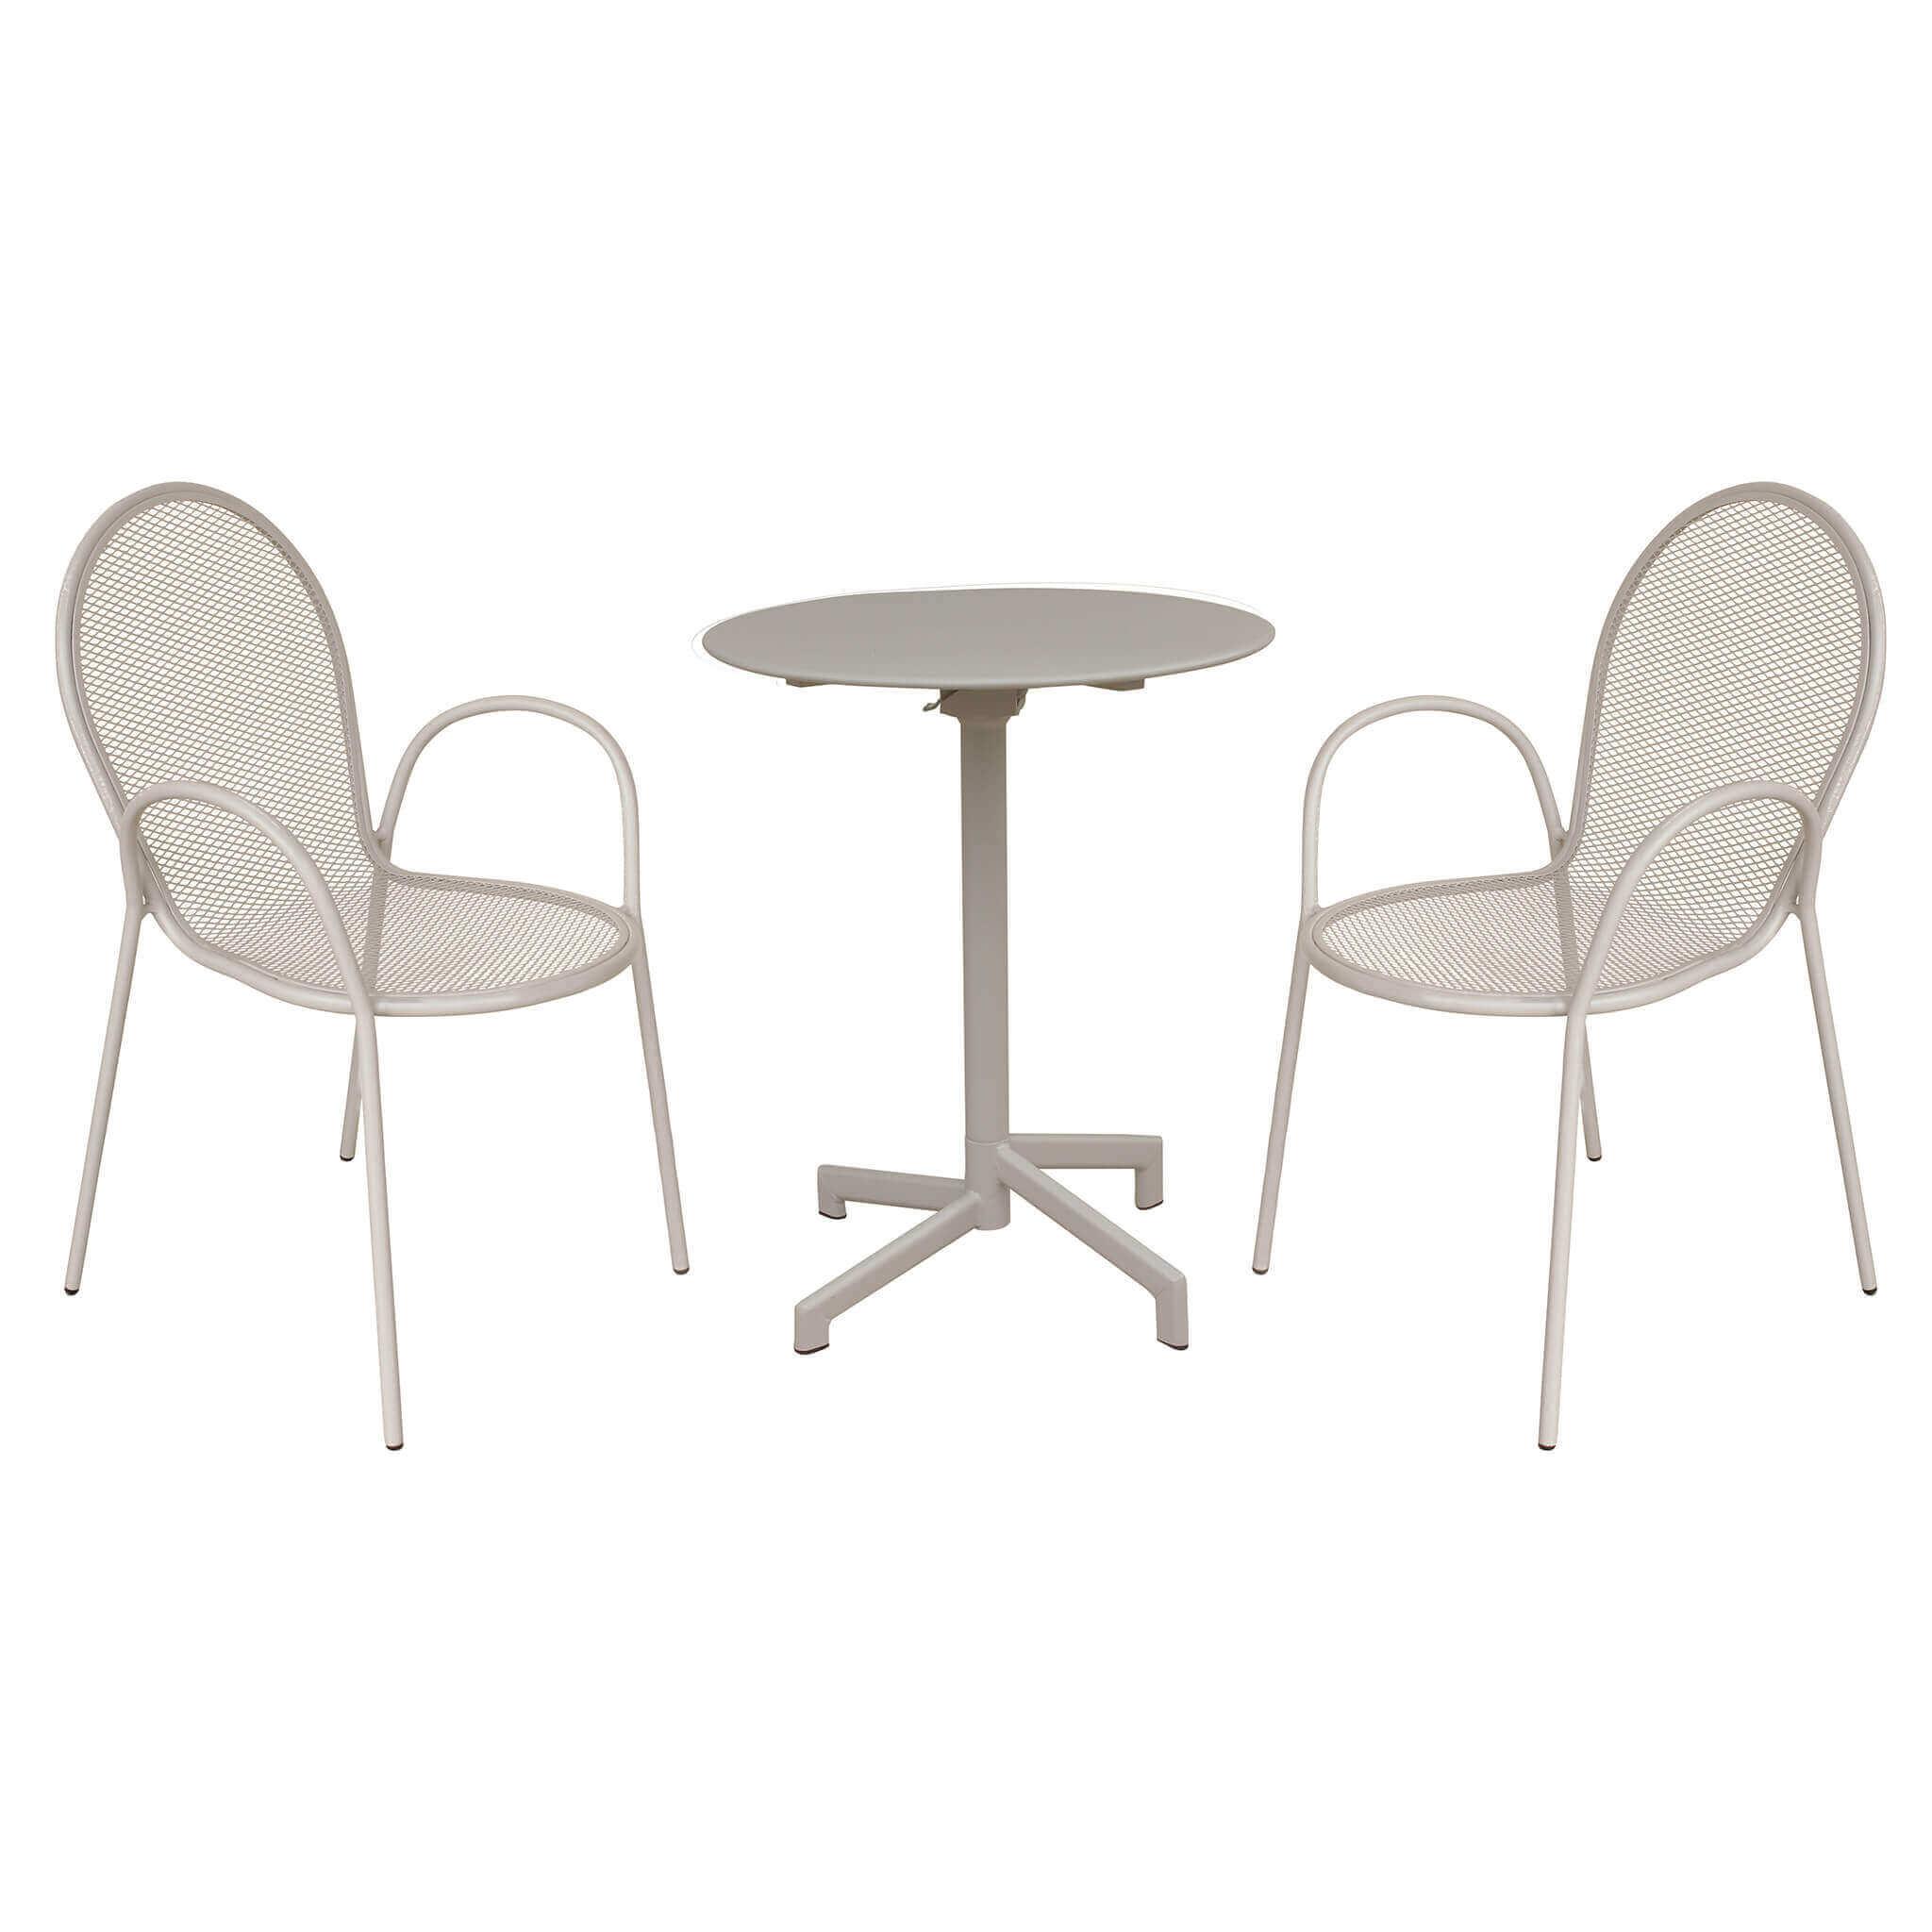 Milani Home OPERA - tavolo da giardino in metallo diametro 60